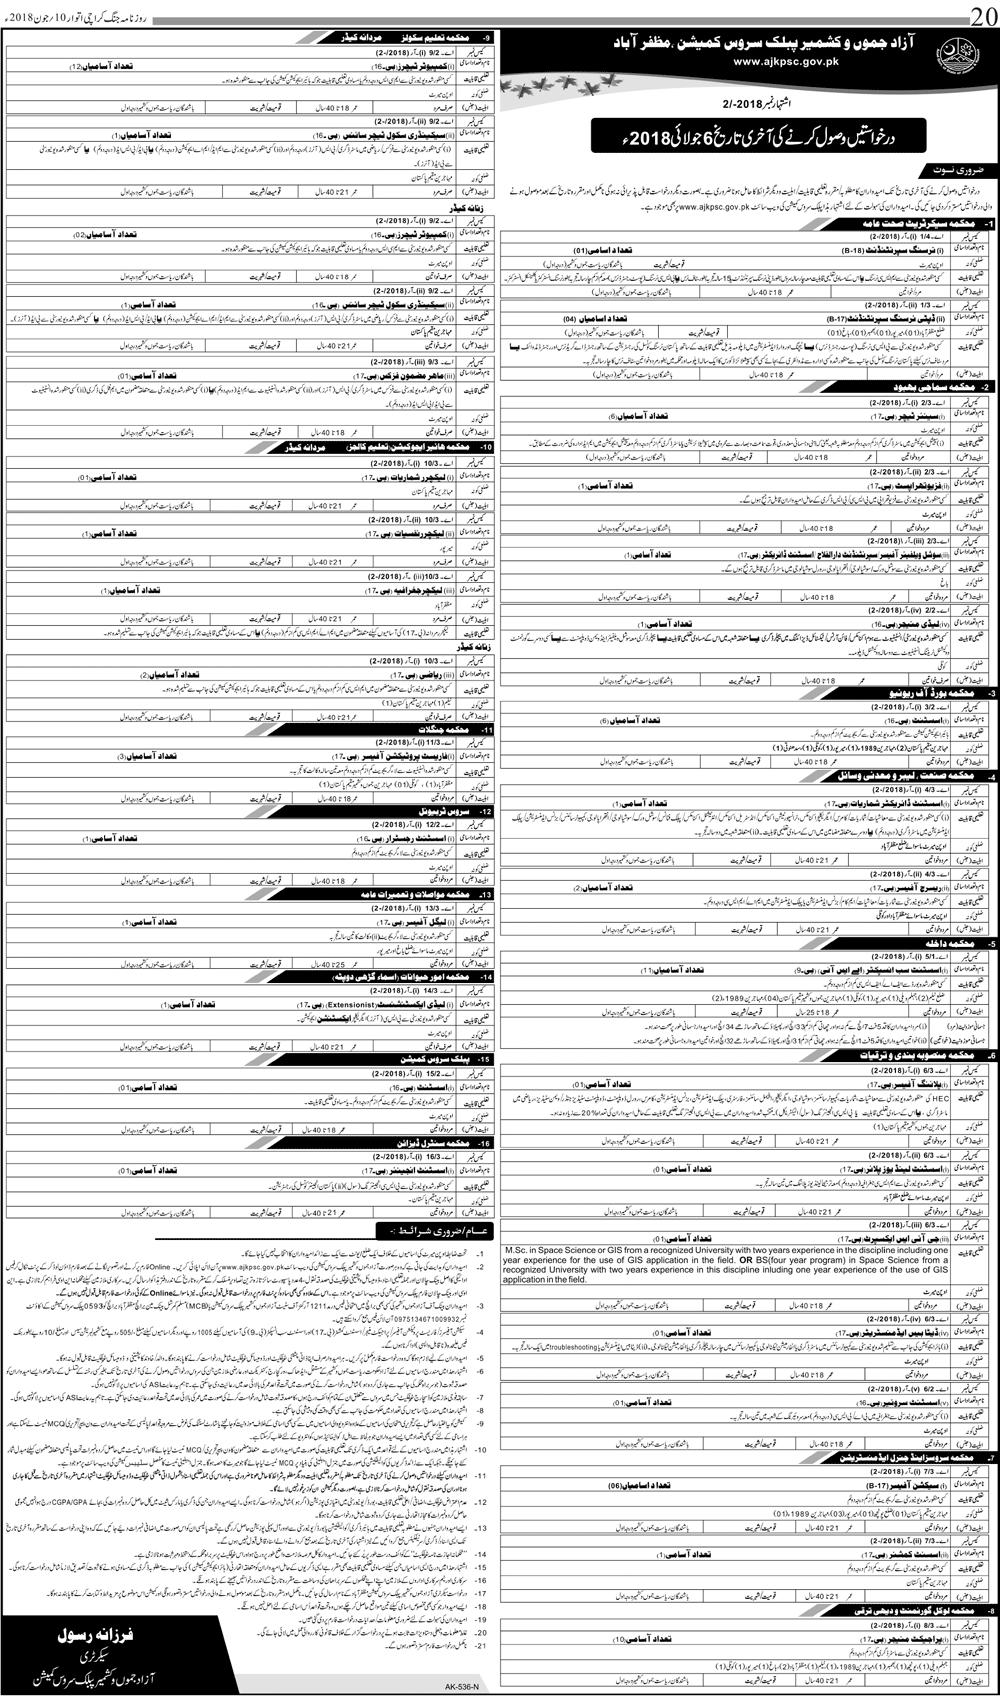 www.ajkpsc.gov.pk Jobs 2018 AJK PSC Jobs Advertisement, Test Result